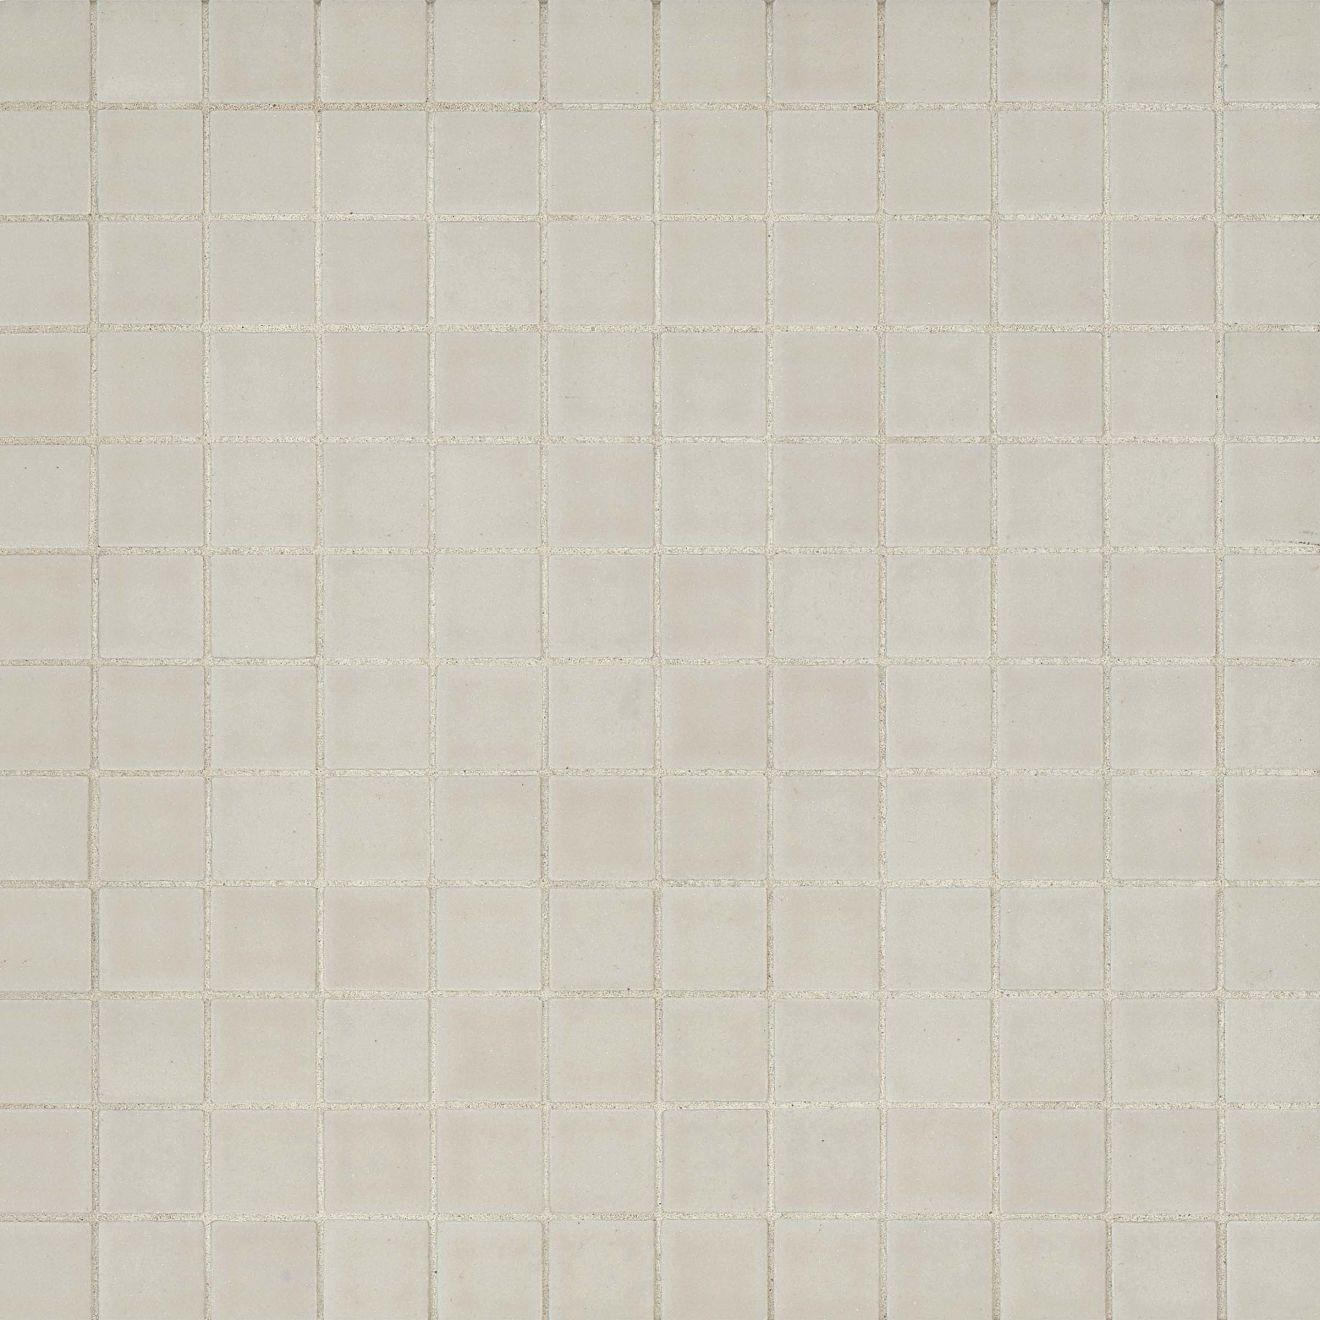 "True 1"" x 1"" Floor & Wall Mosaic in Canvas"